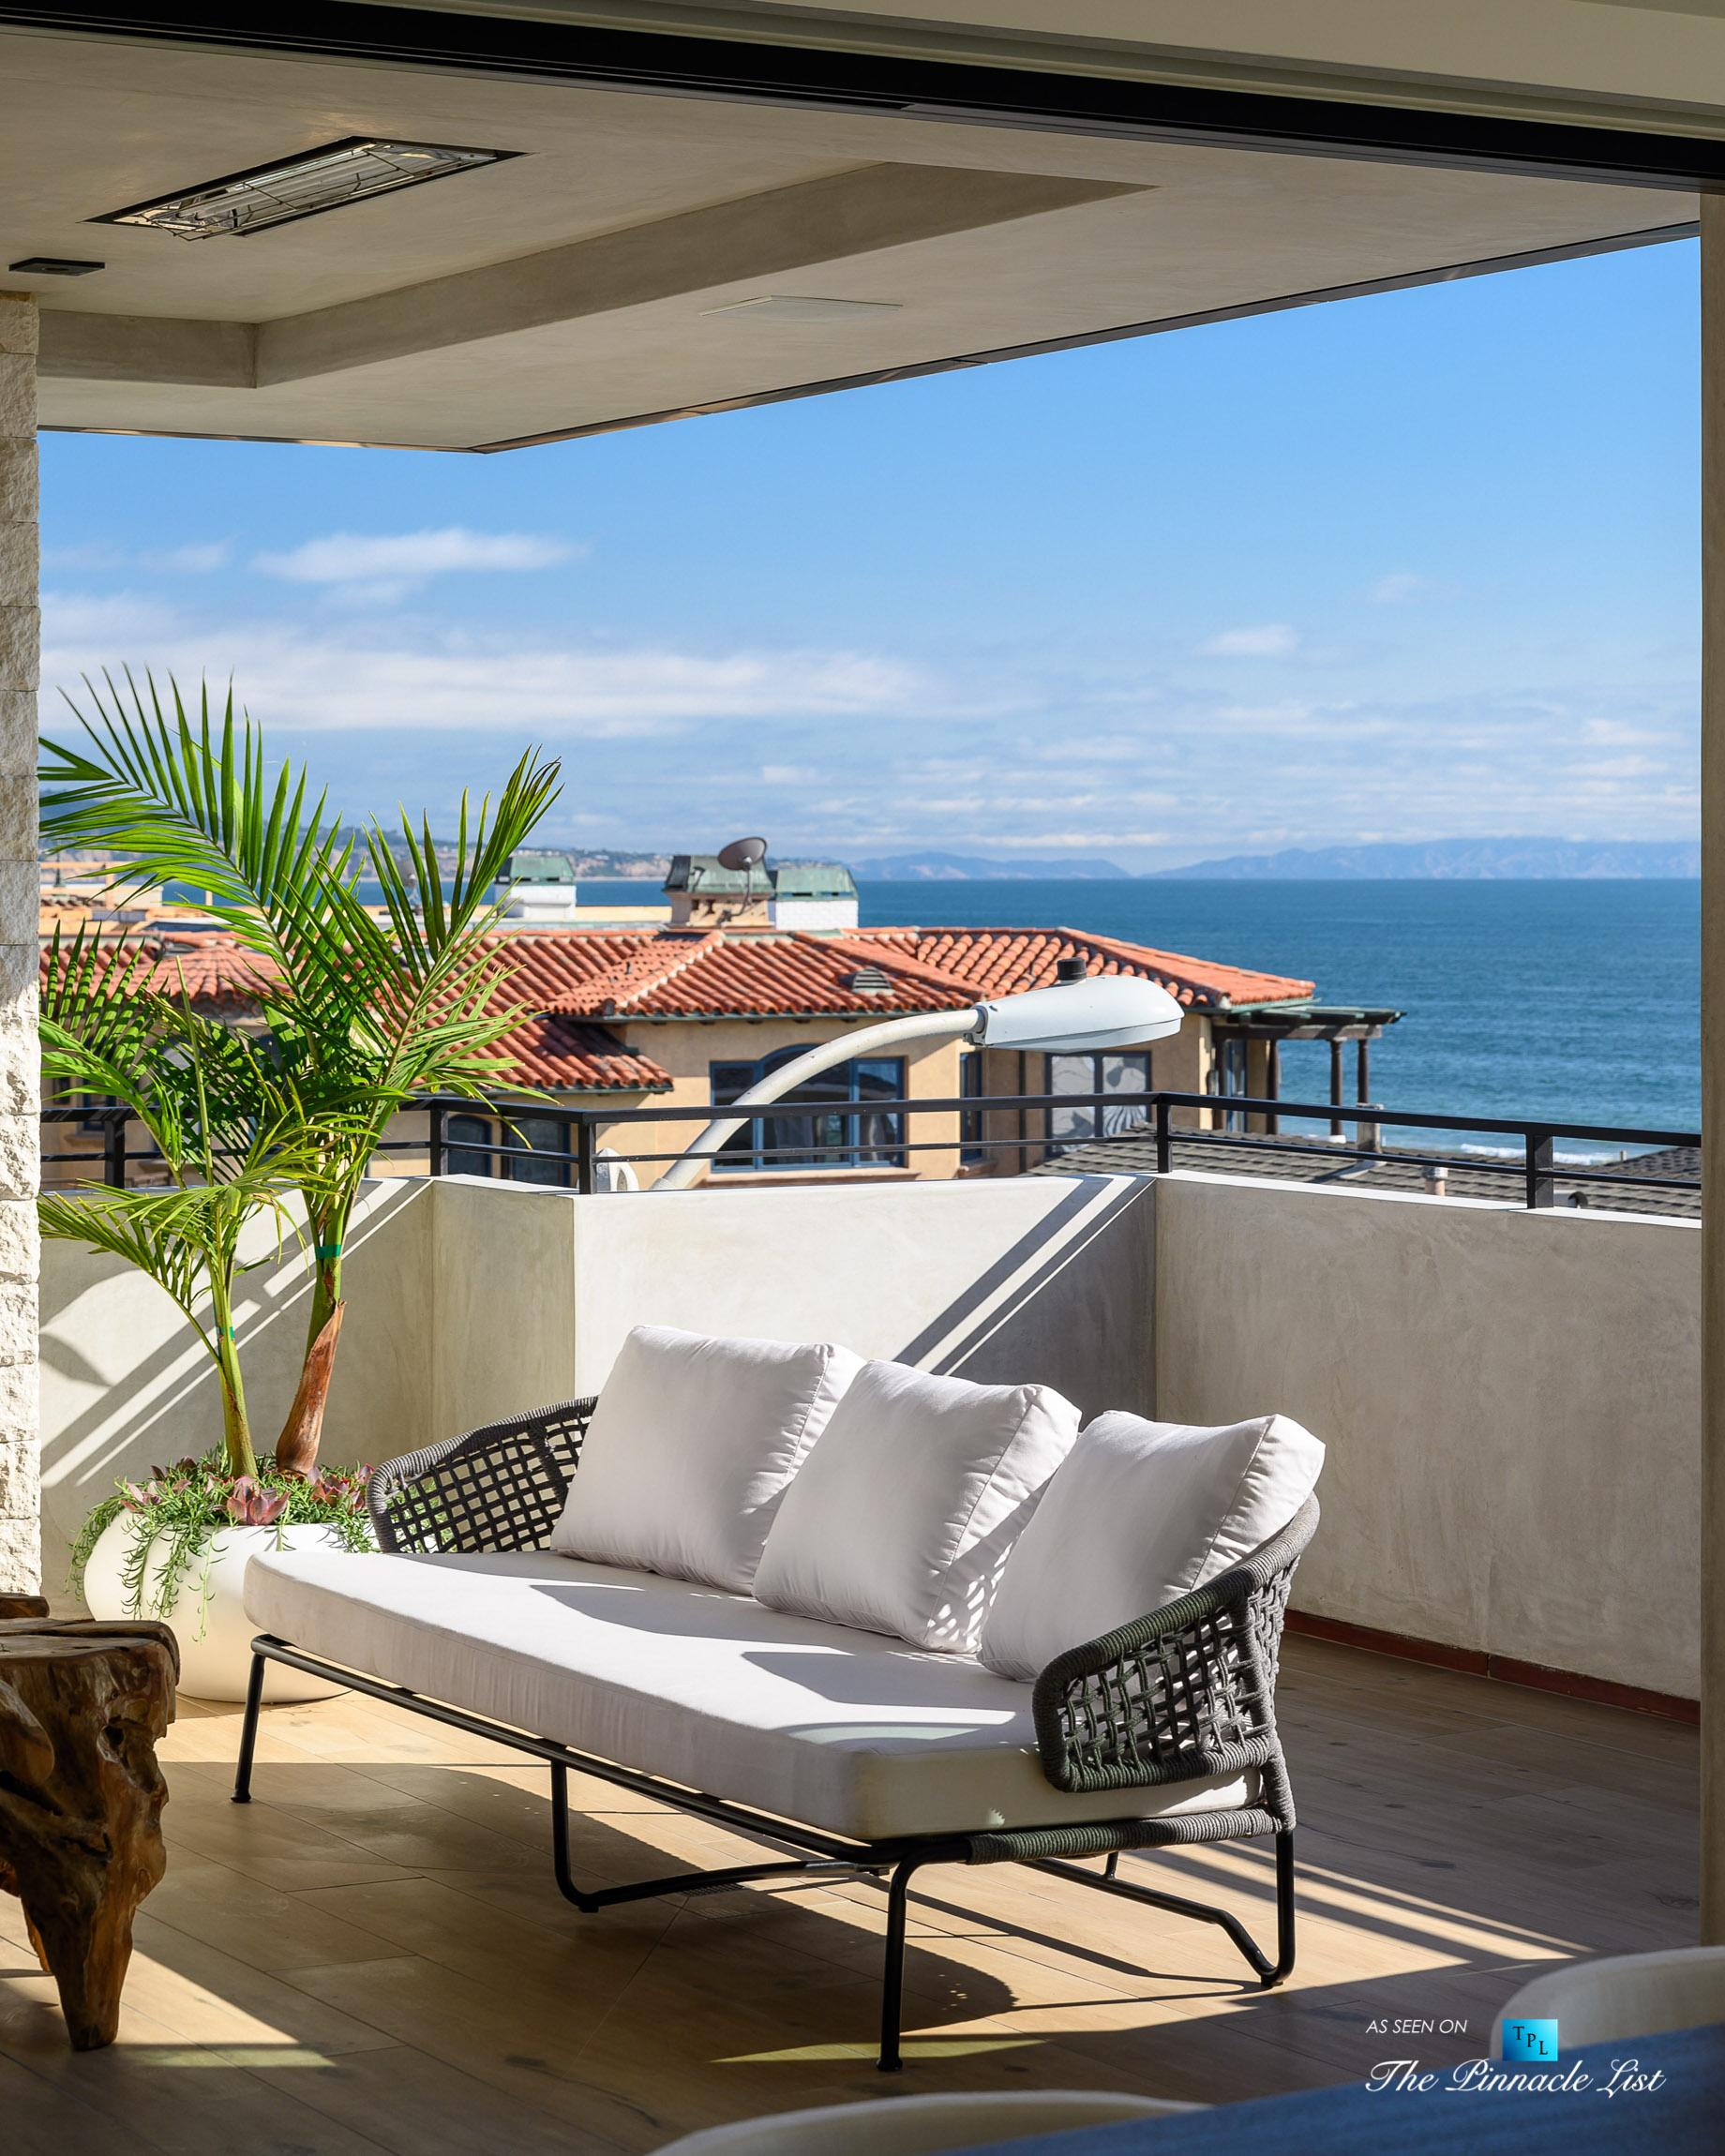 2016 Ocean Dr, Manhattan Beach, CA, USA - Covered Interior Balcony View - Luxury Real Estate - Modern Ocean View Home